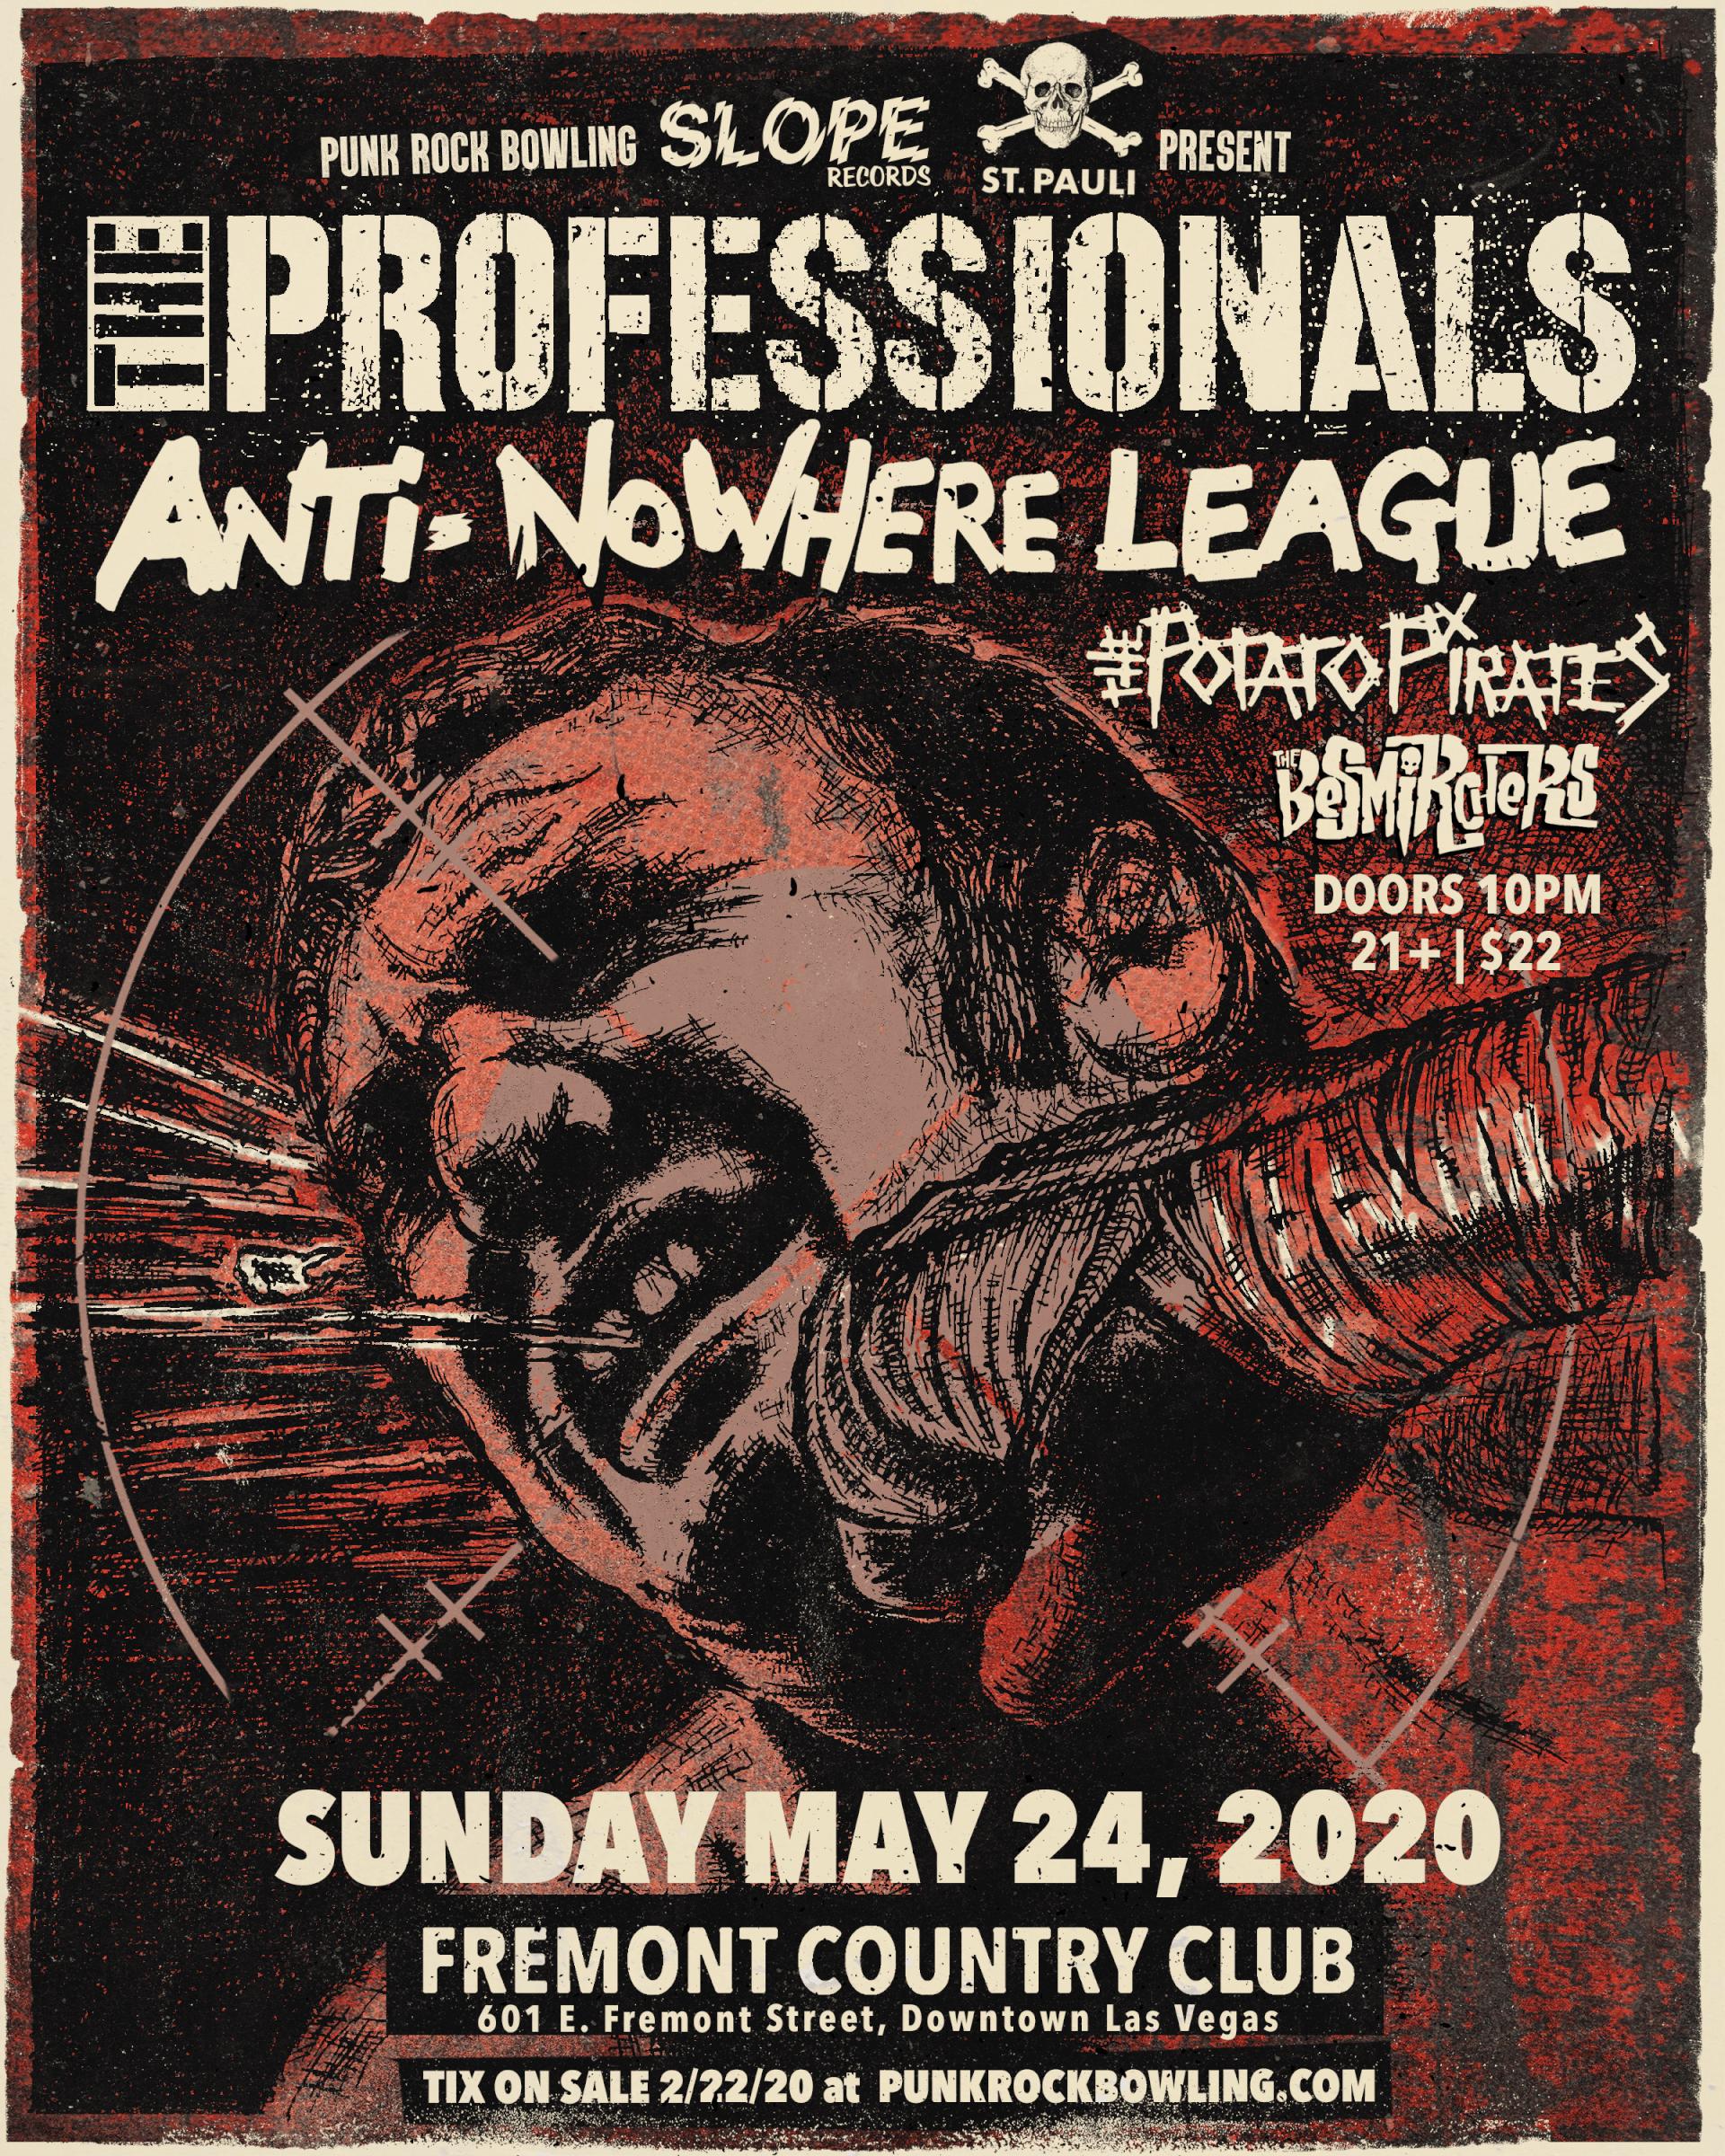 The Professionals, Anti-NoWhere League, Punk Rock Bowling 2020